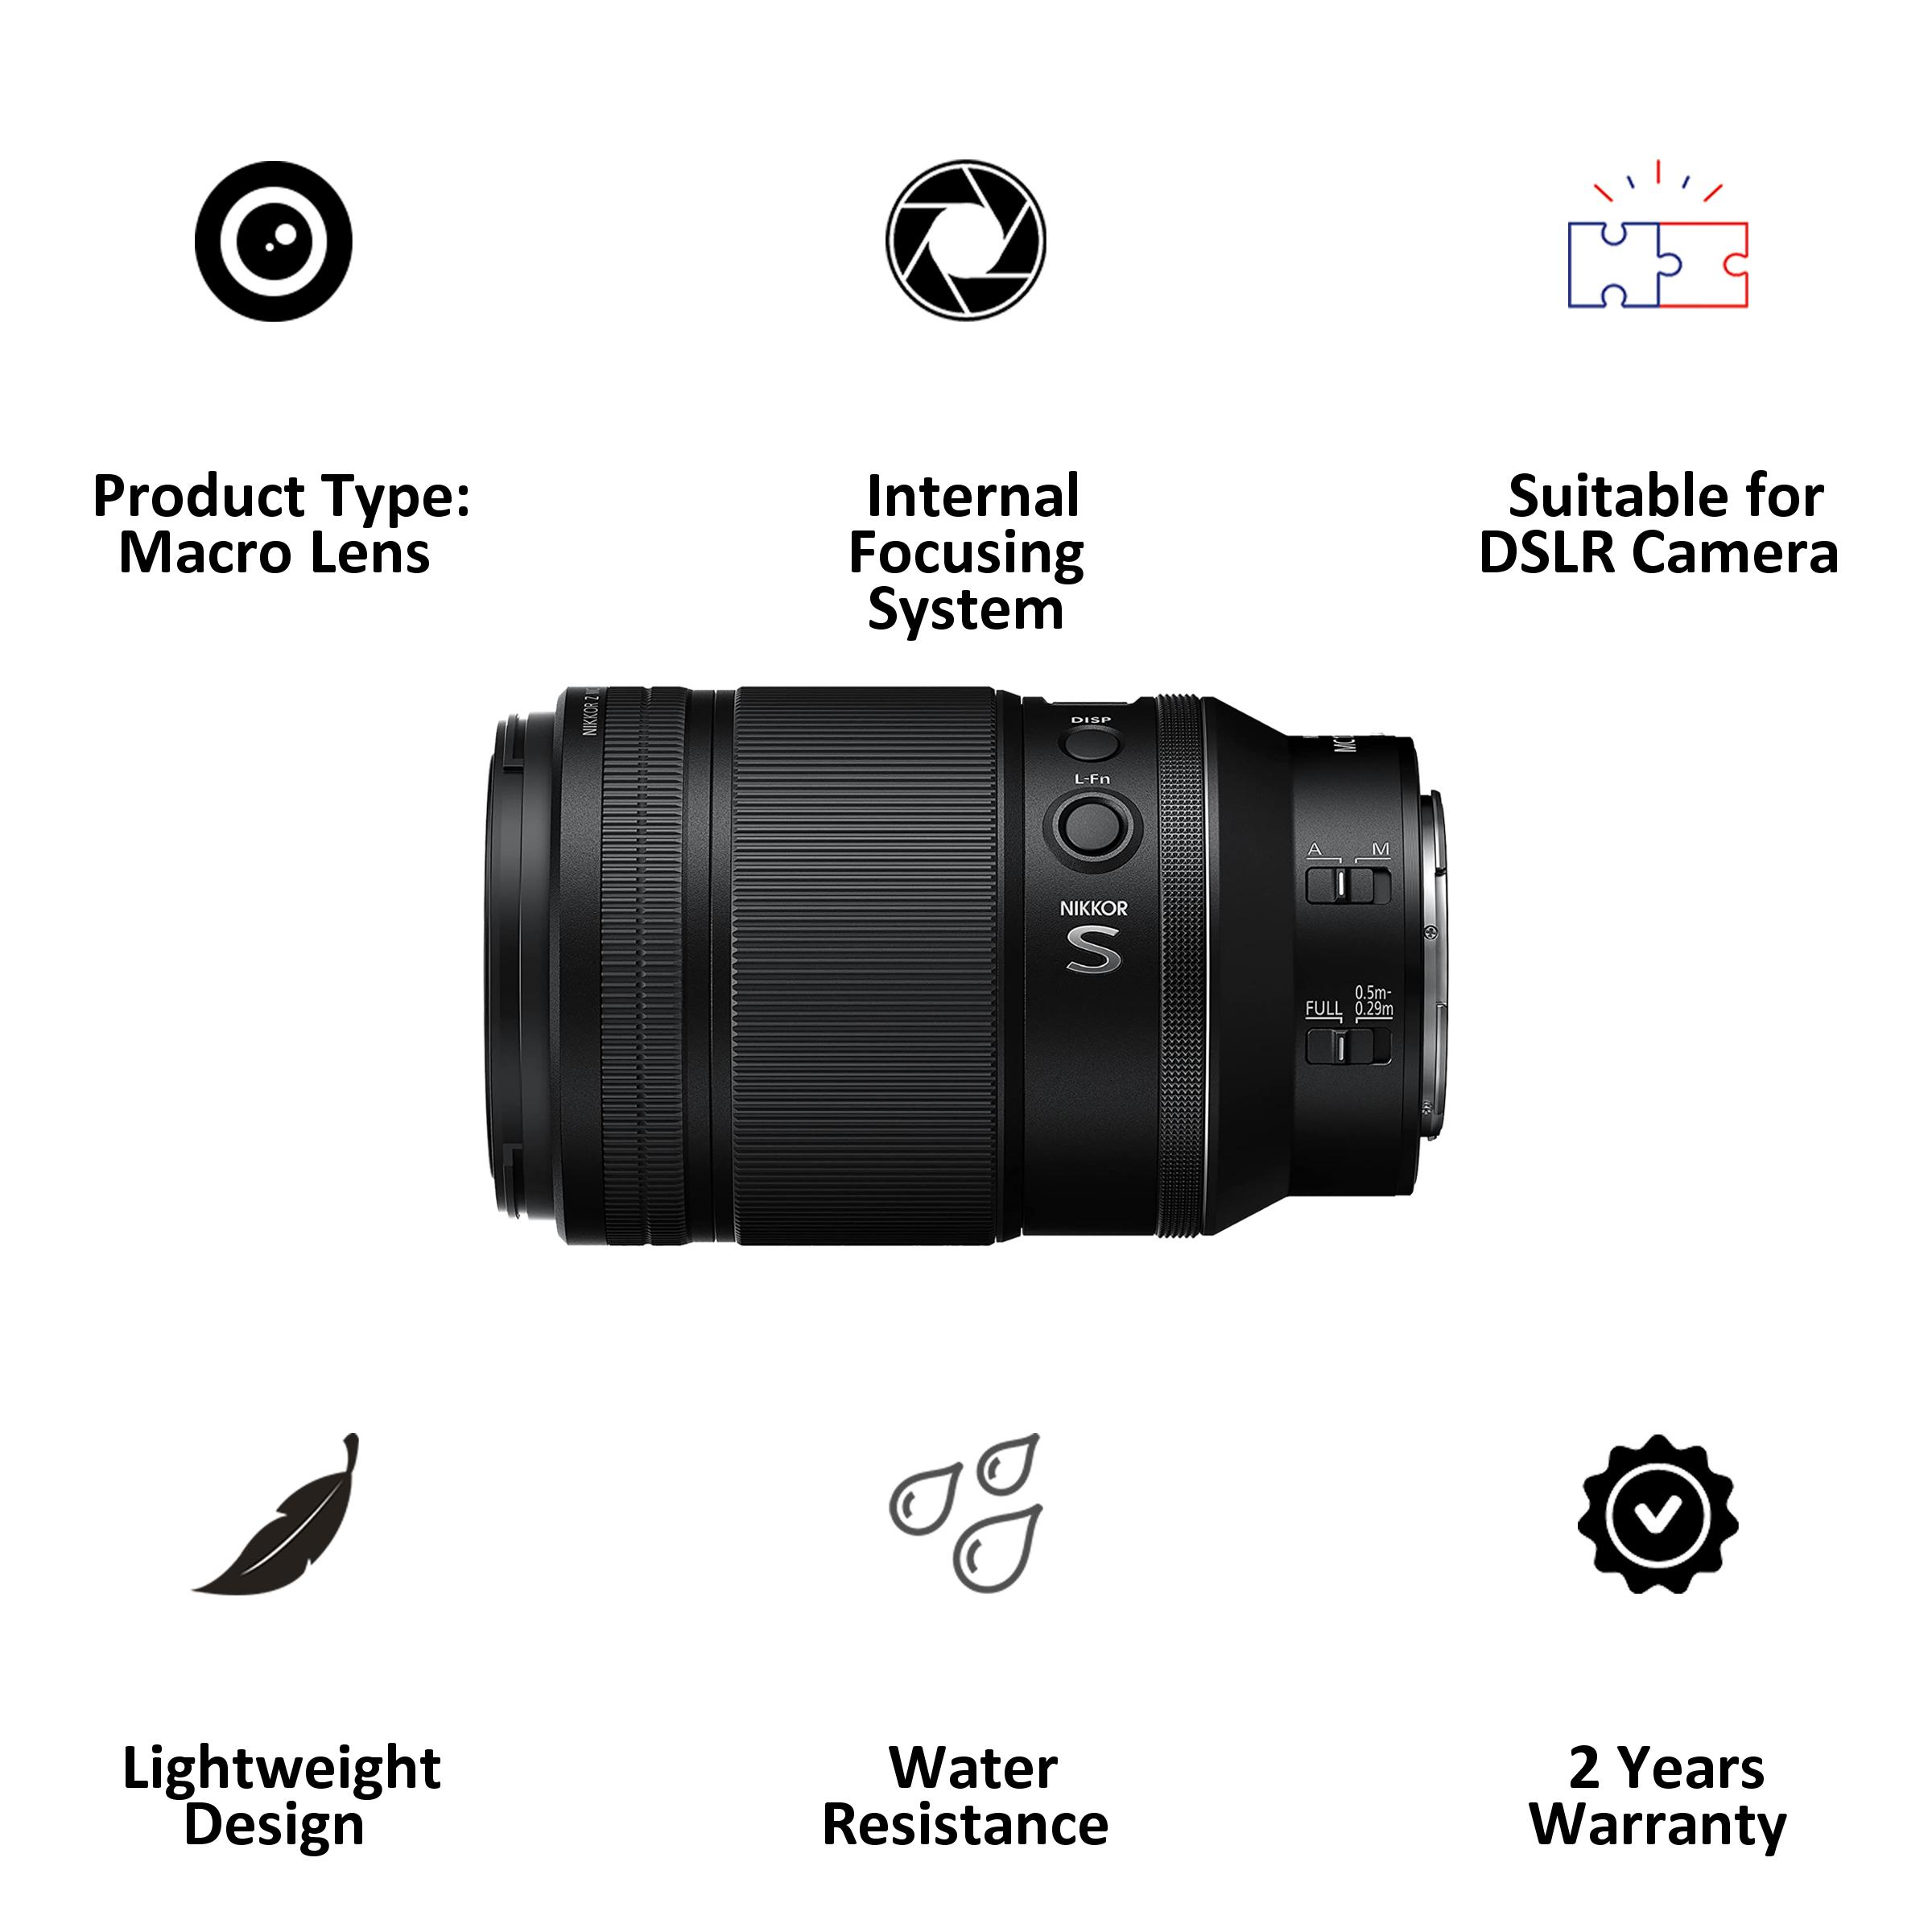 Lens - Nikon Nikkor Z MC 105mm f/2.8 VR S105 mm F32-F2.8 Macro Lens (1:1 Magnification, JMA602DA, Black)_3